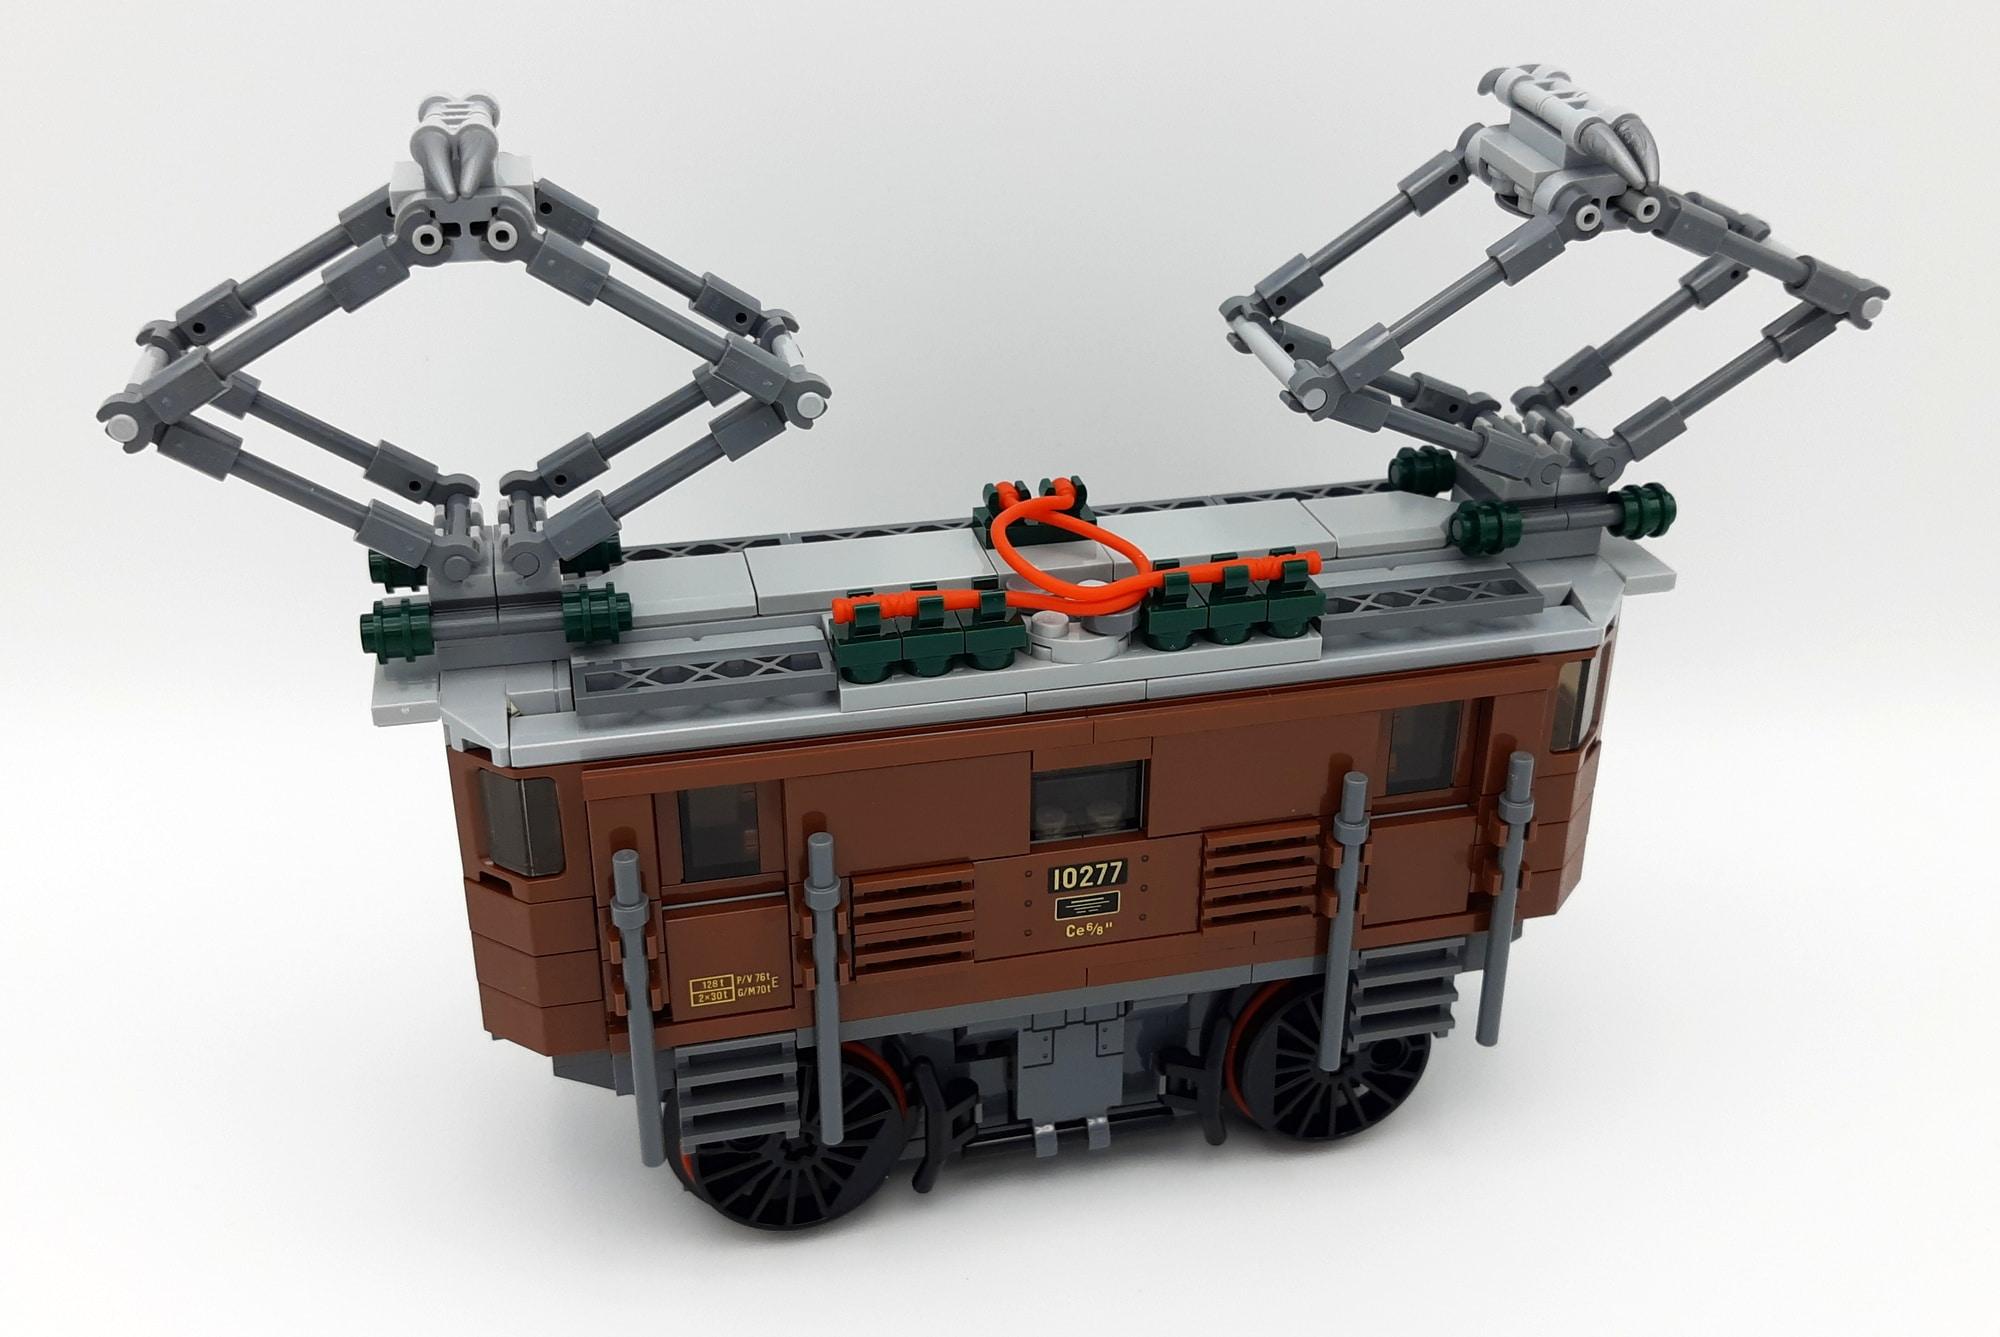 LEGO 10277 Krokodil Lokomotive - Bauabschnitt 3